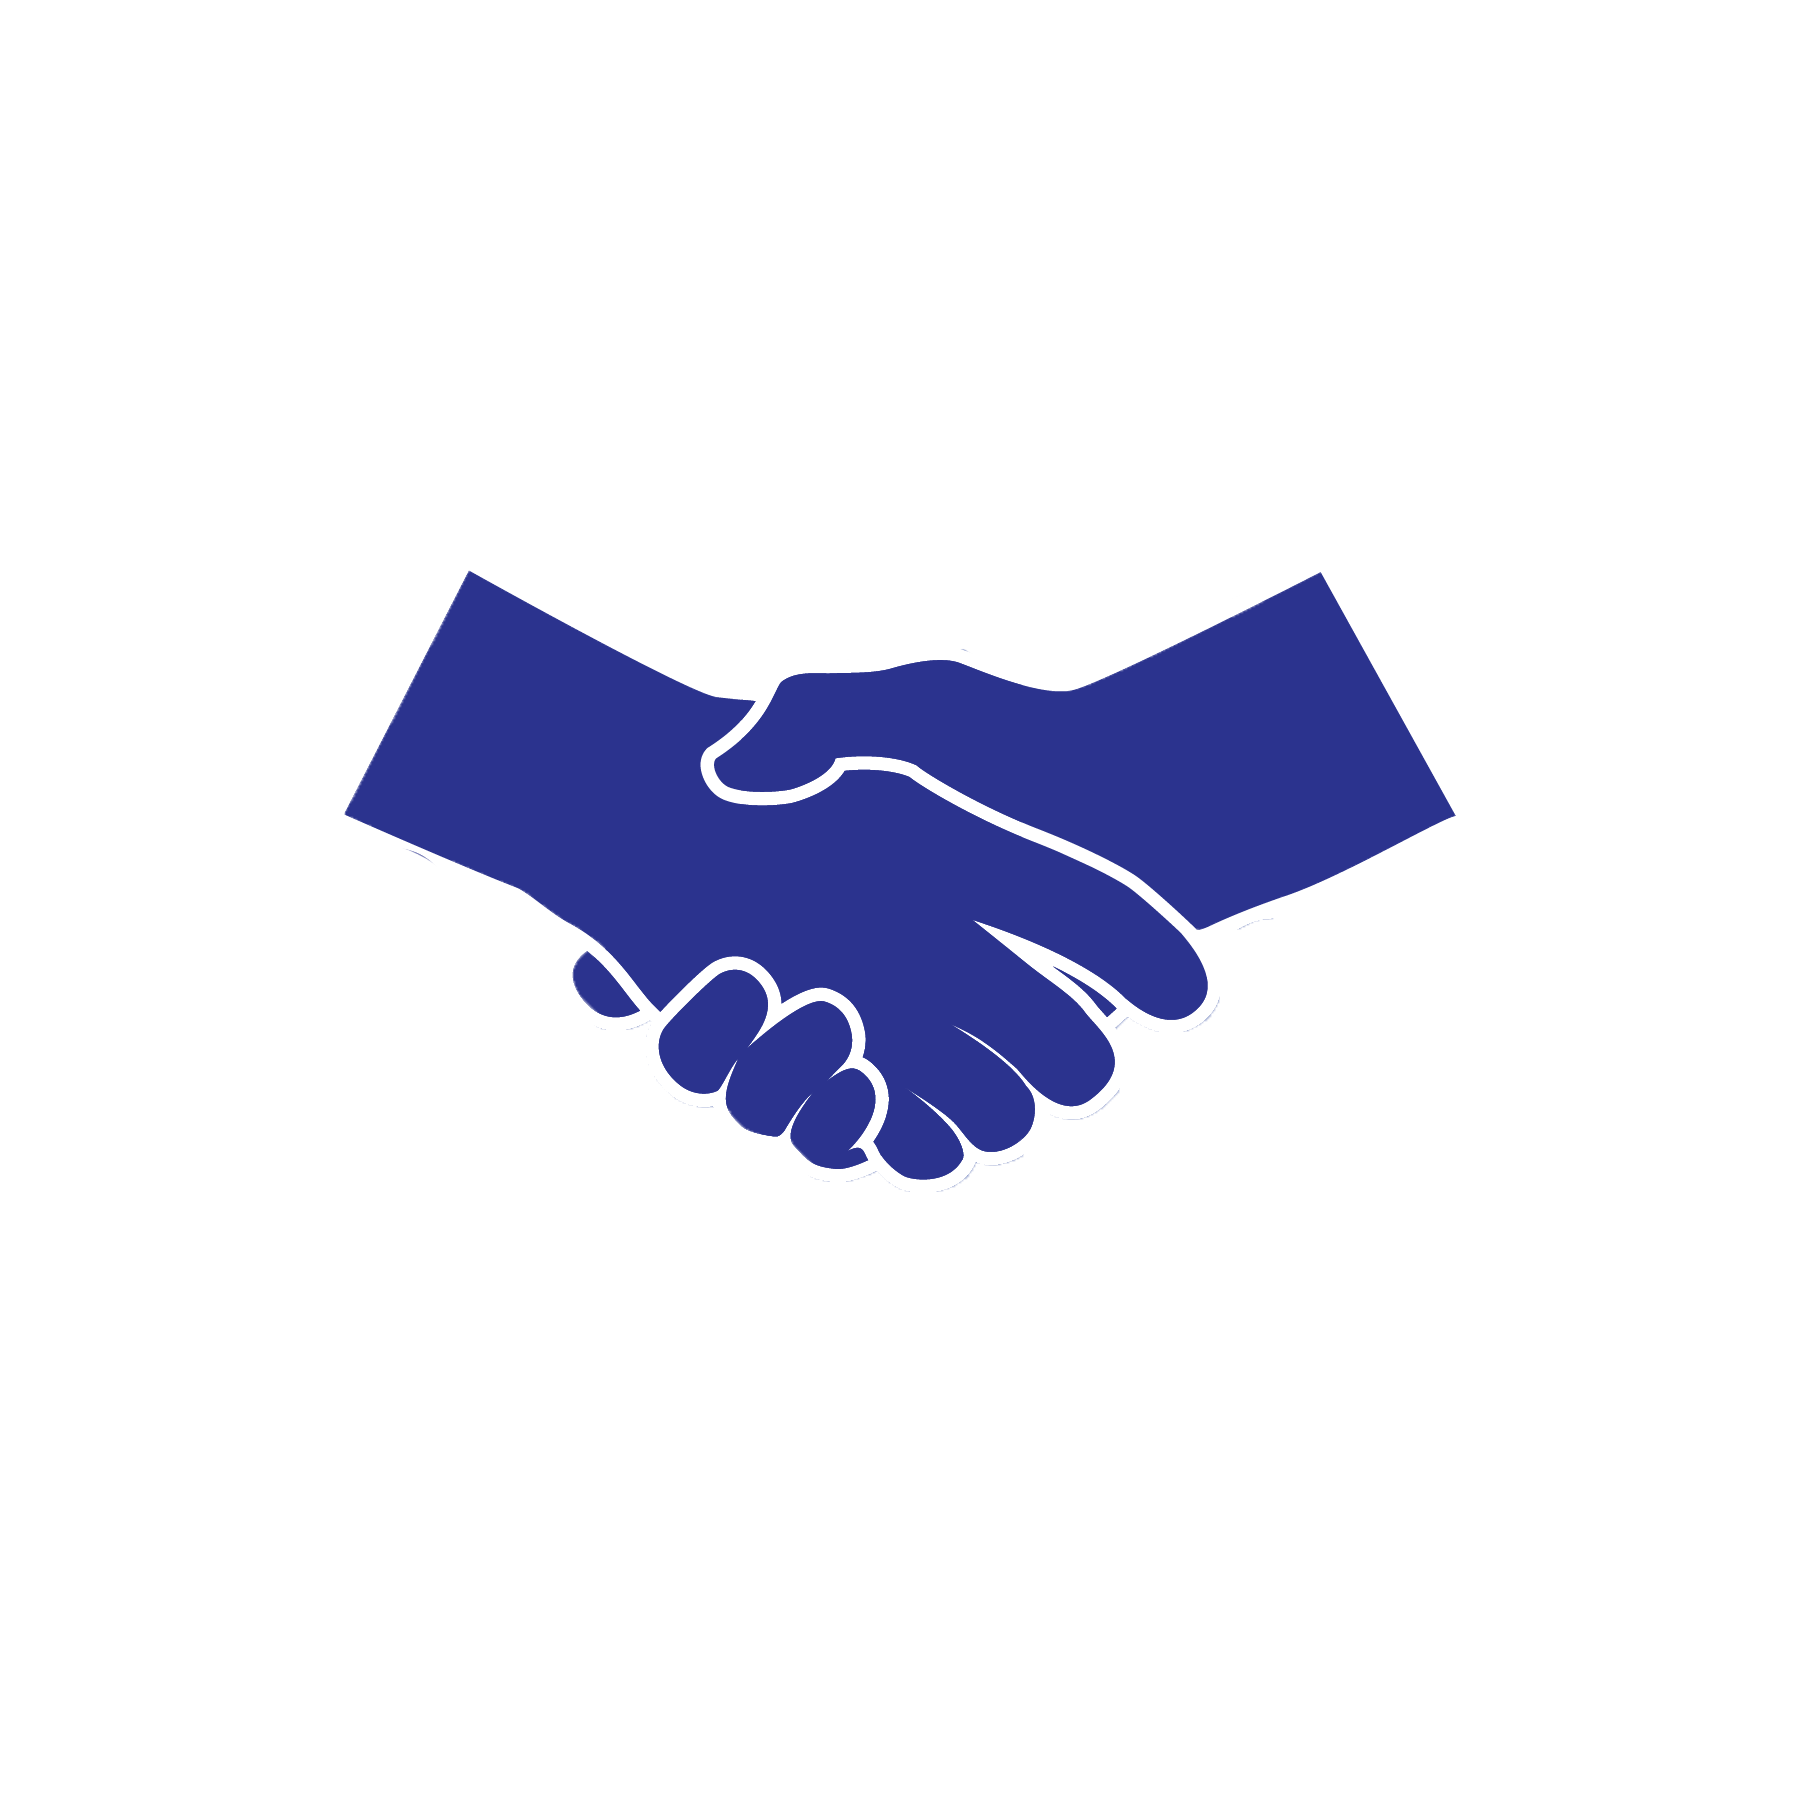 PPIFA Handshake